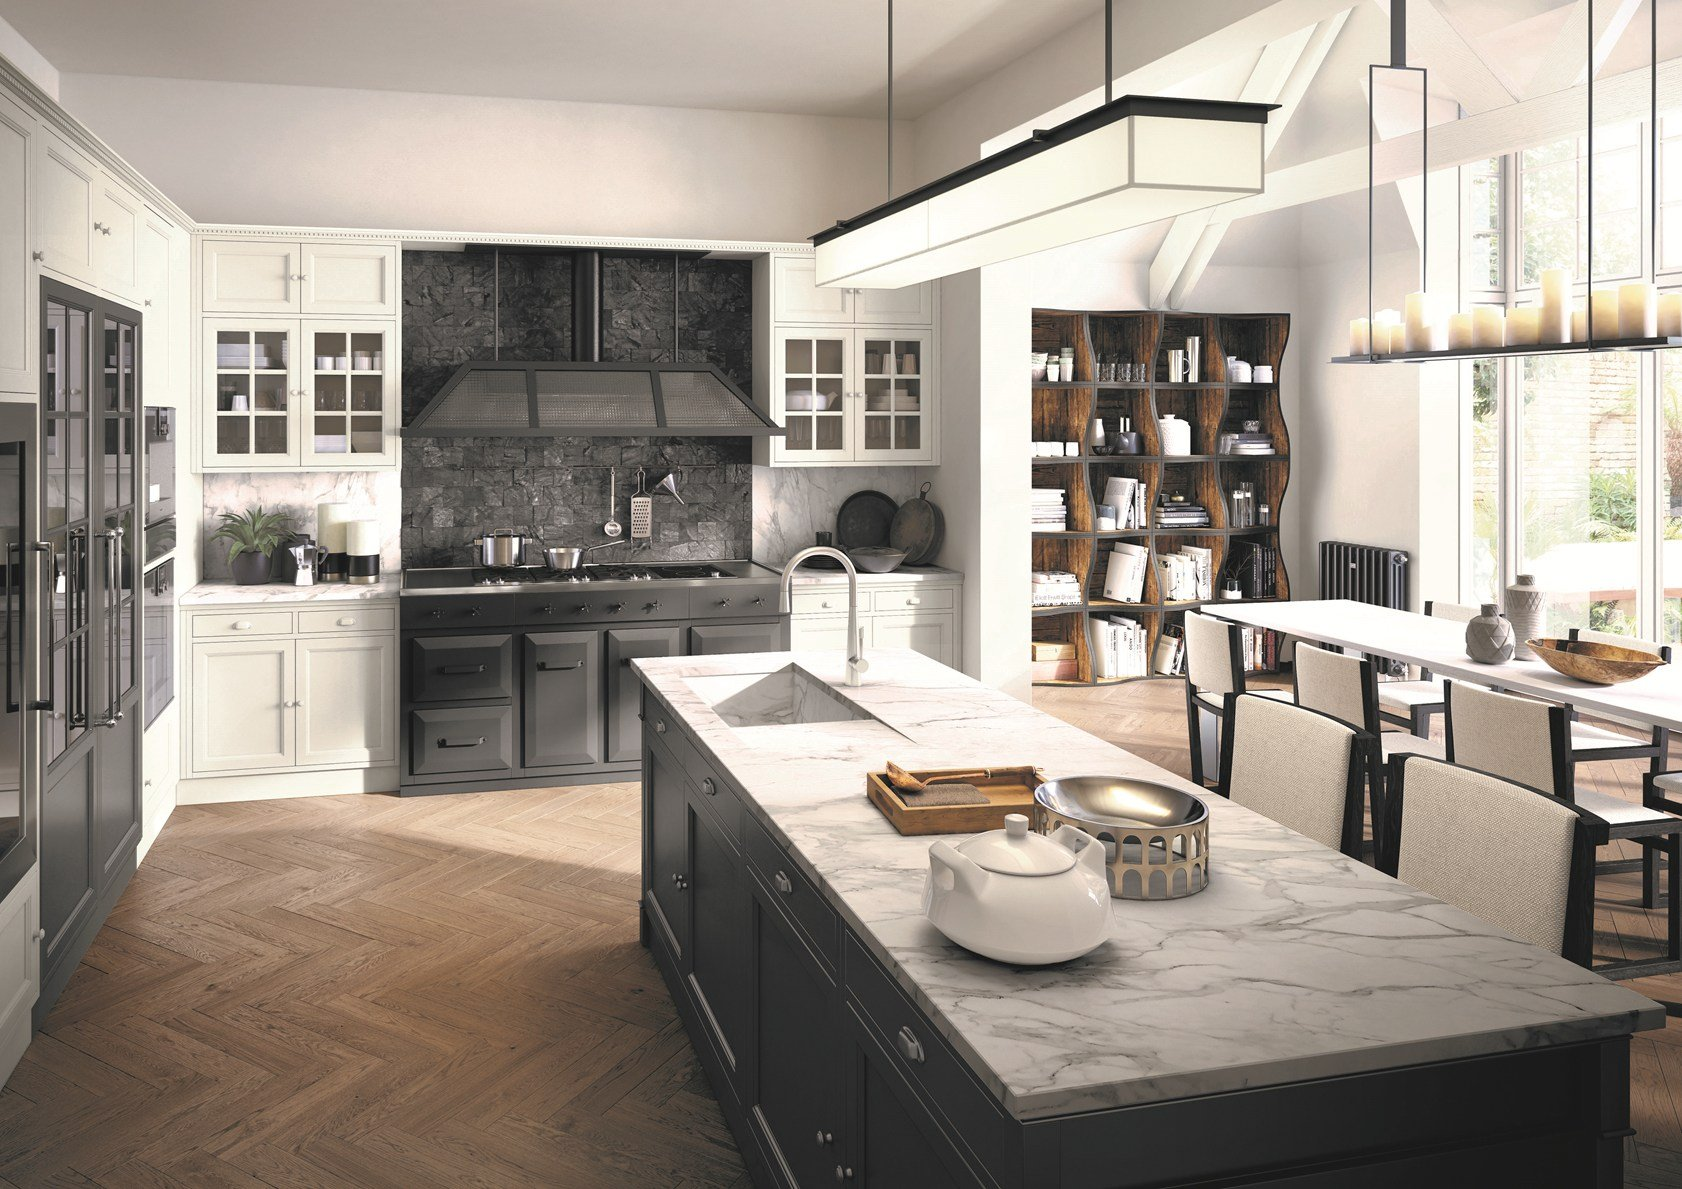 Linea artis di marchi cucine - Tipologie di cucine ...